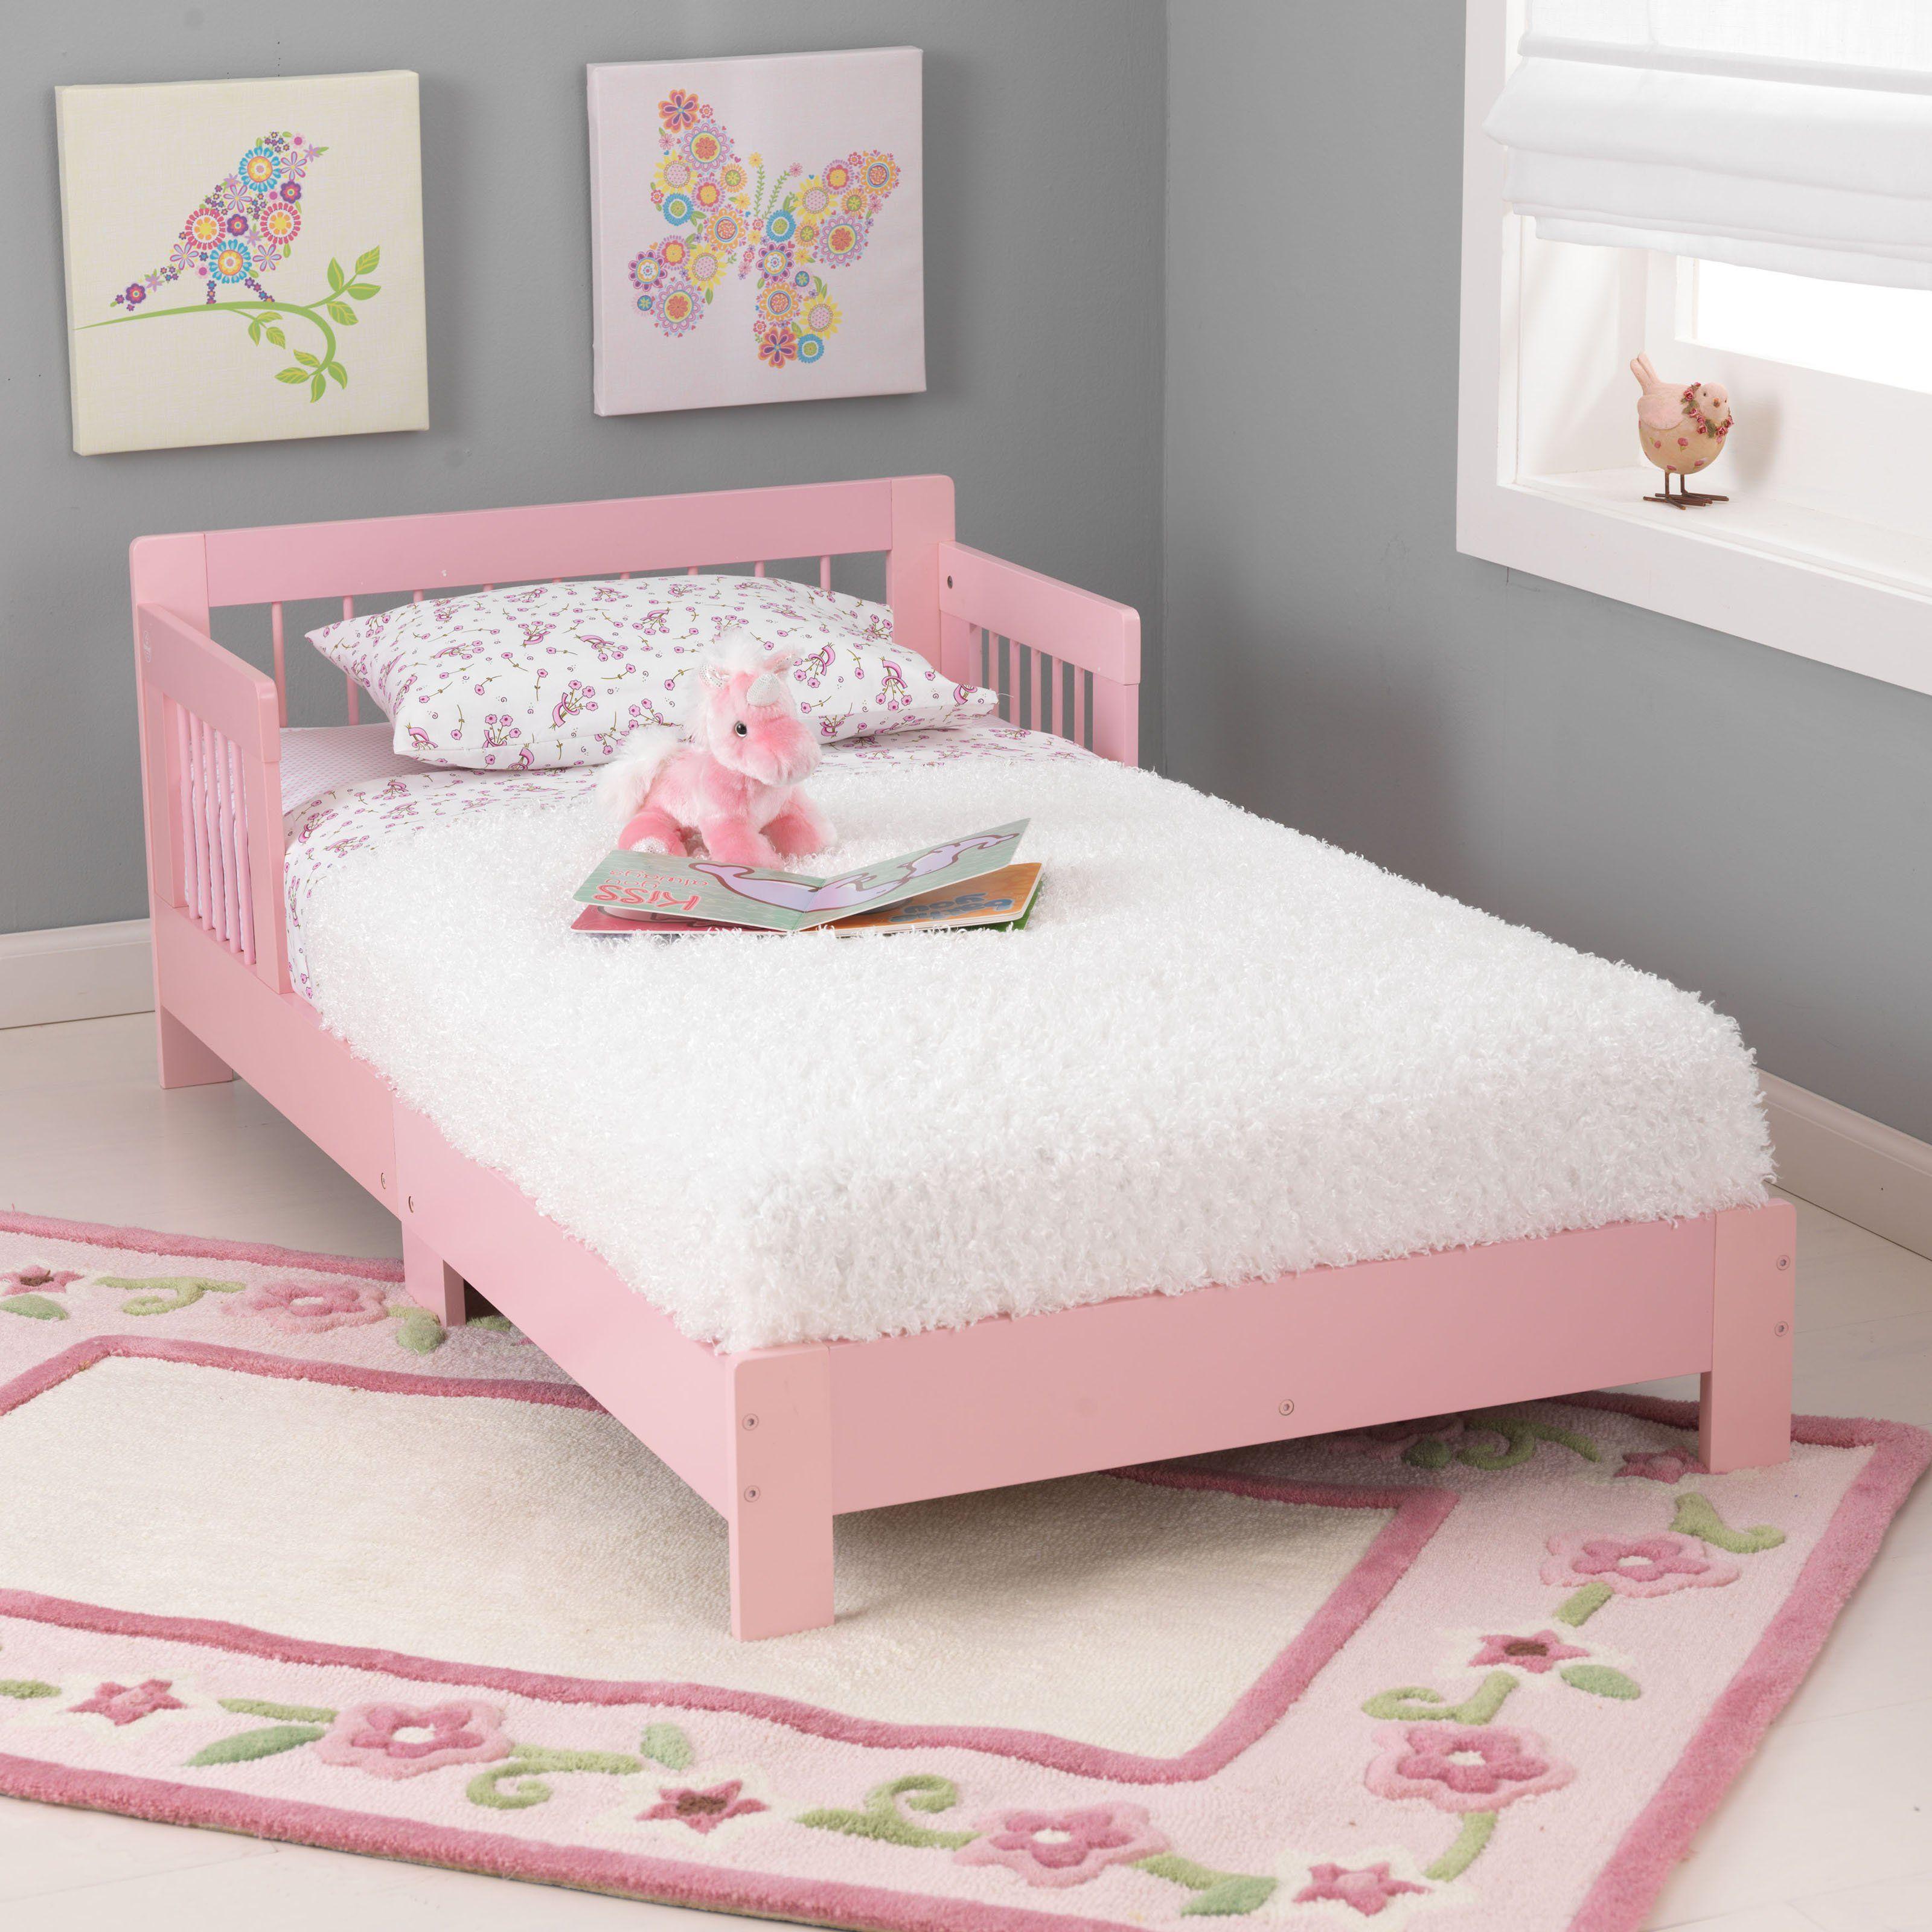 KidKraft Pink Houston Toddler Bed | from hayneedle.com